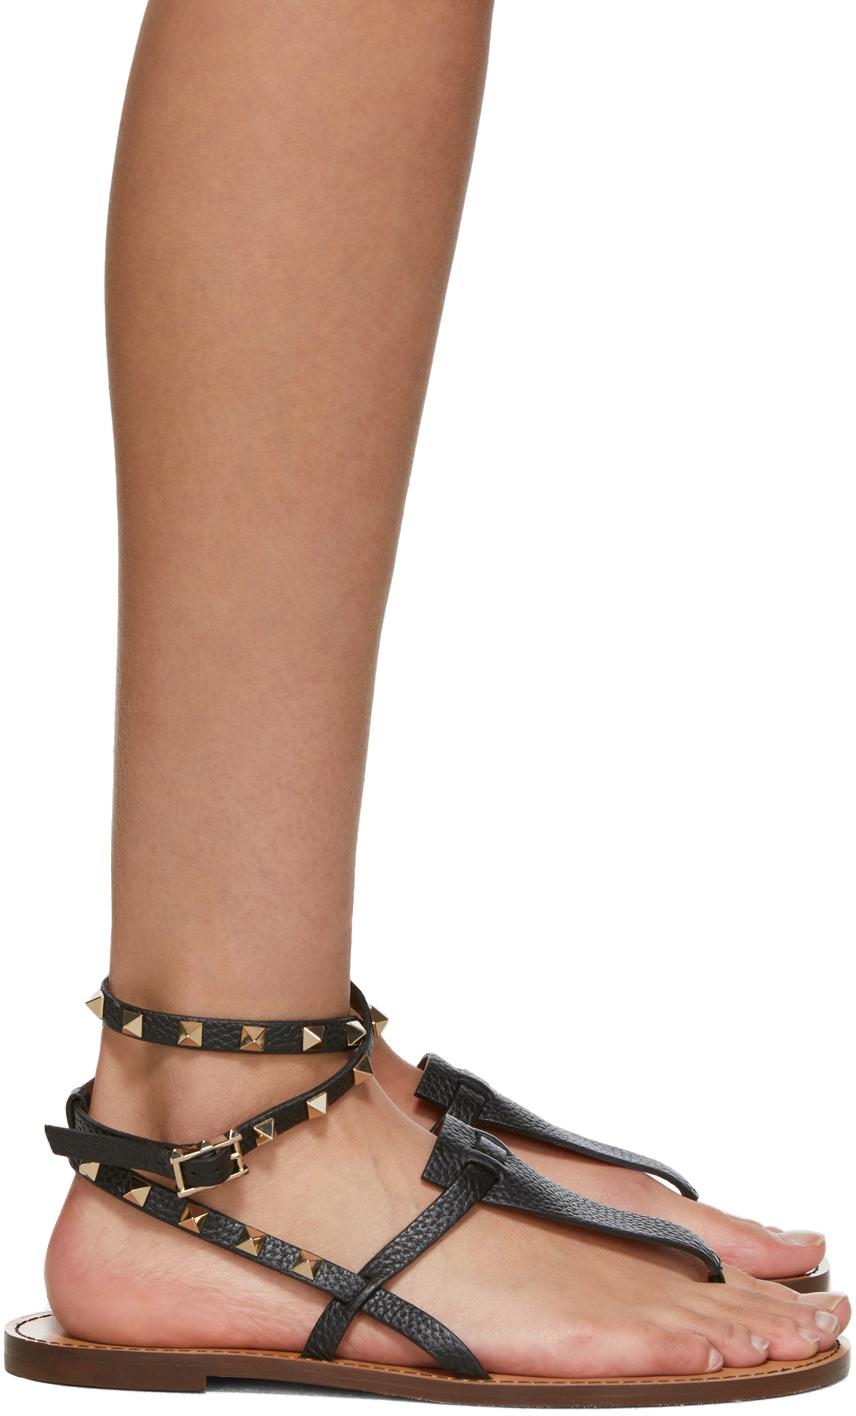 Valentino Garavani 黑色 Rockstud 踝带凉鞋